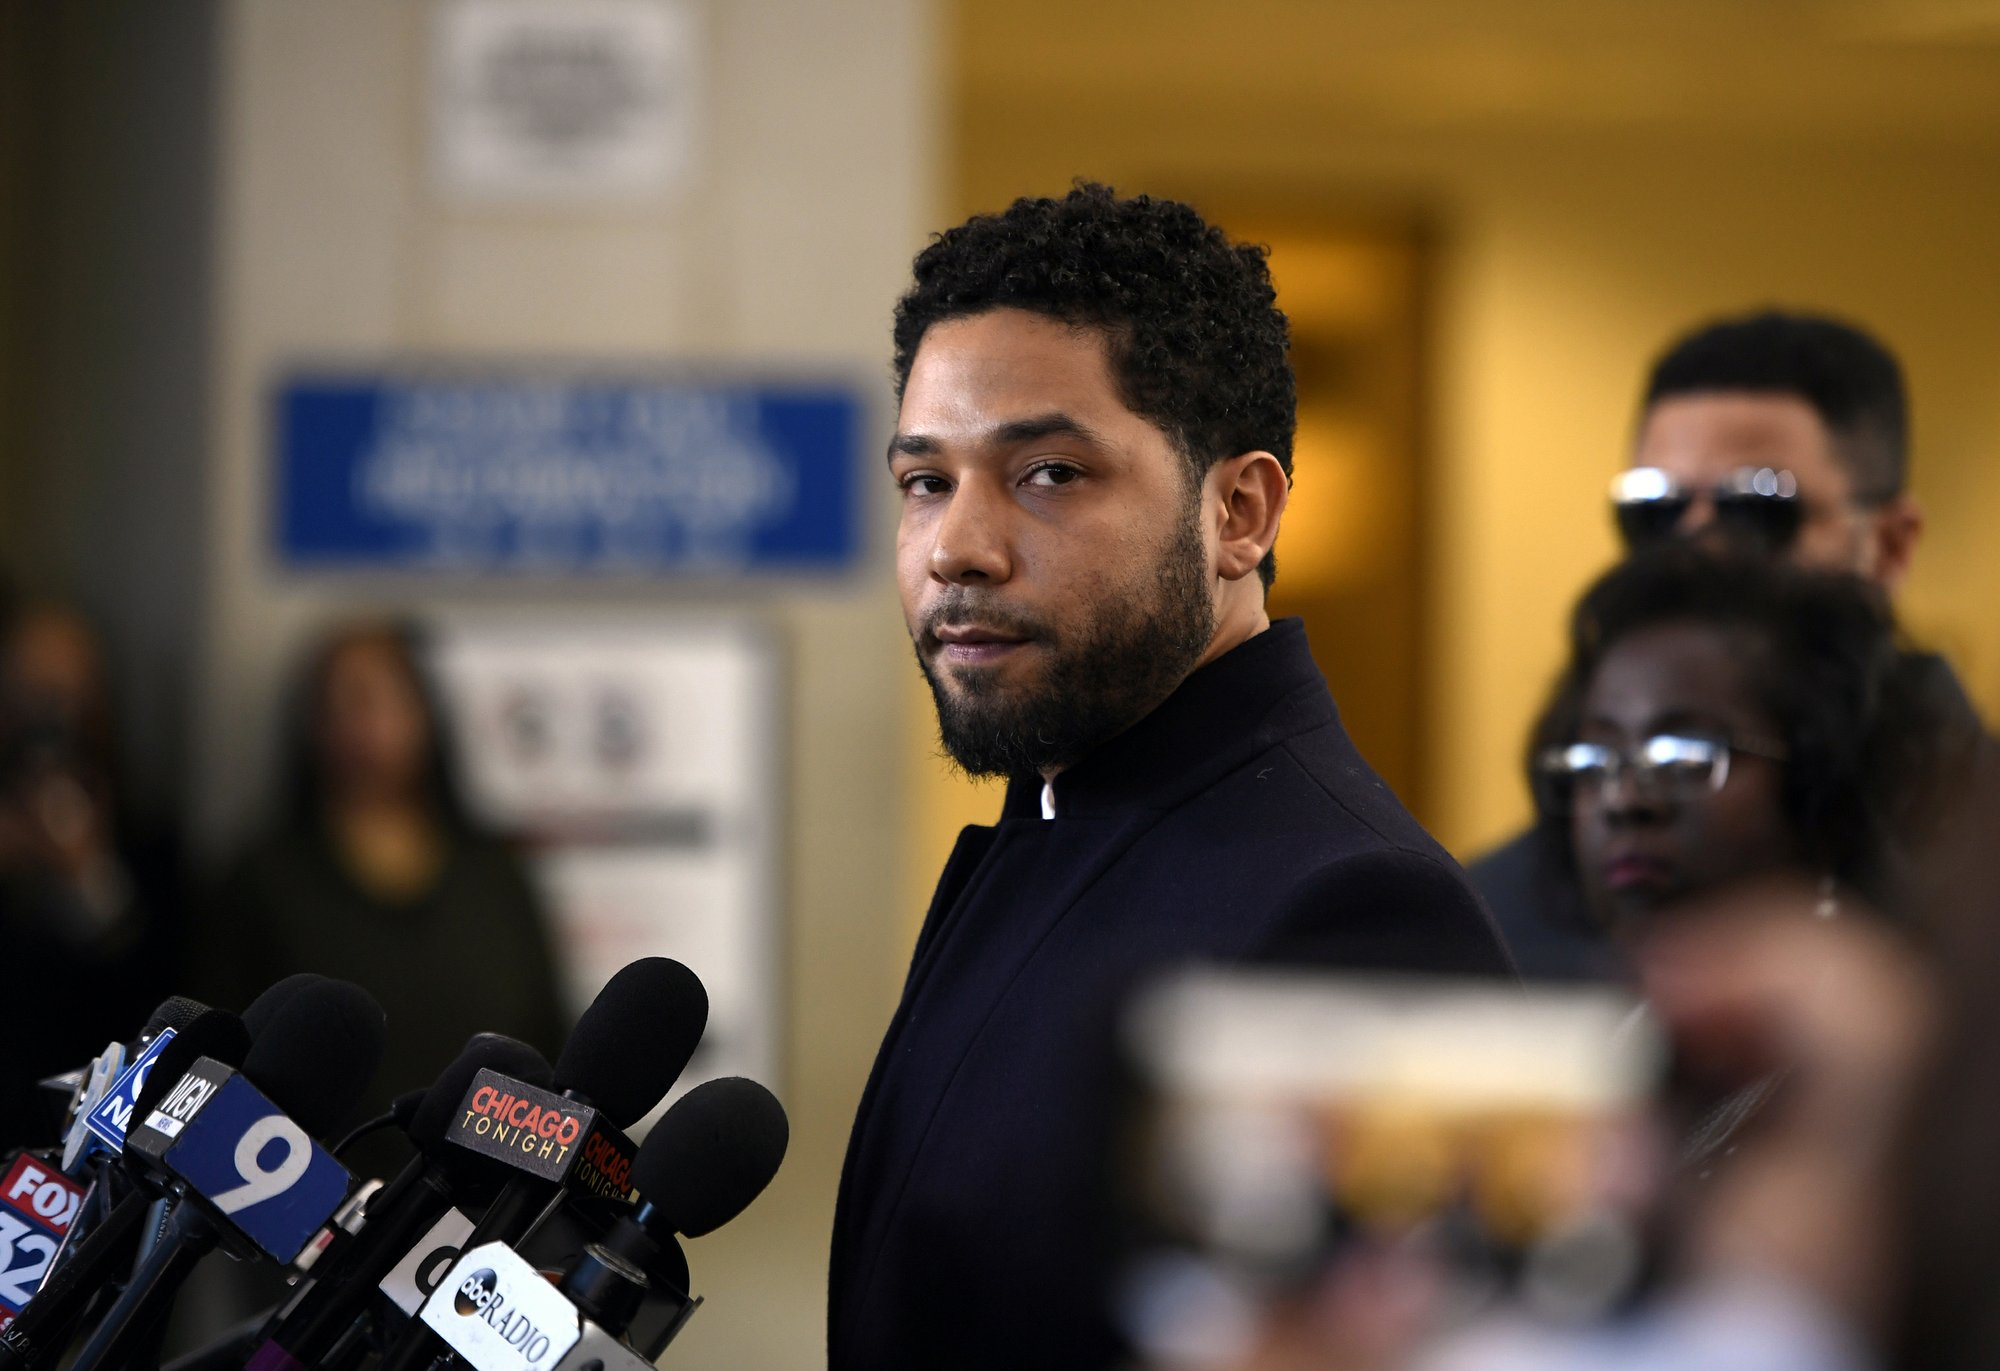 Prosecutor shifts Smollett recusal reasons, releases files